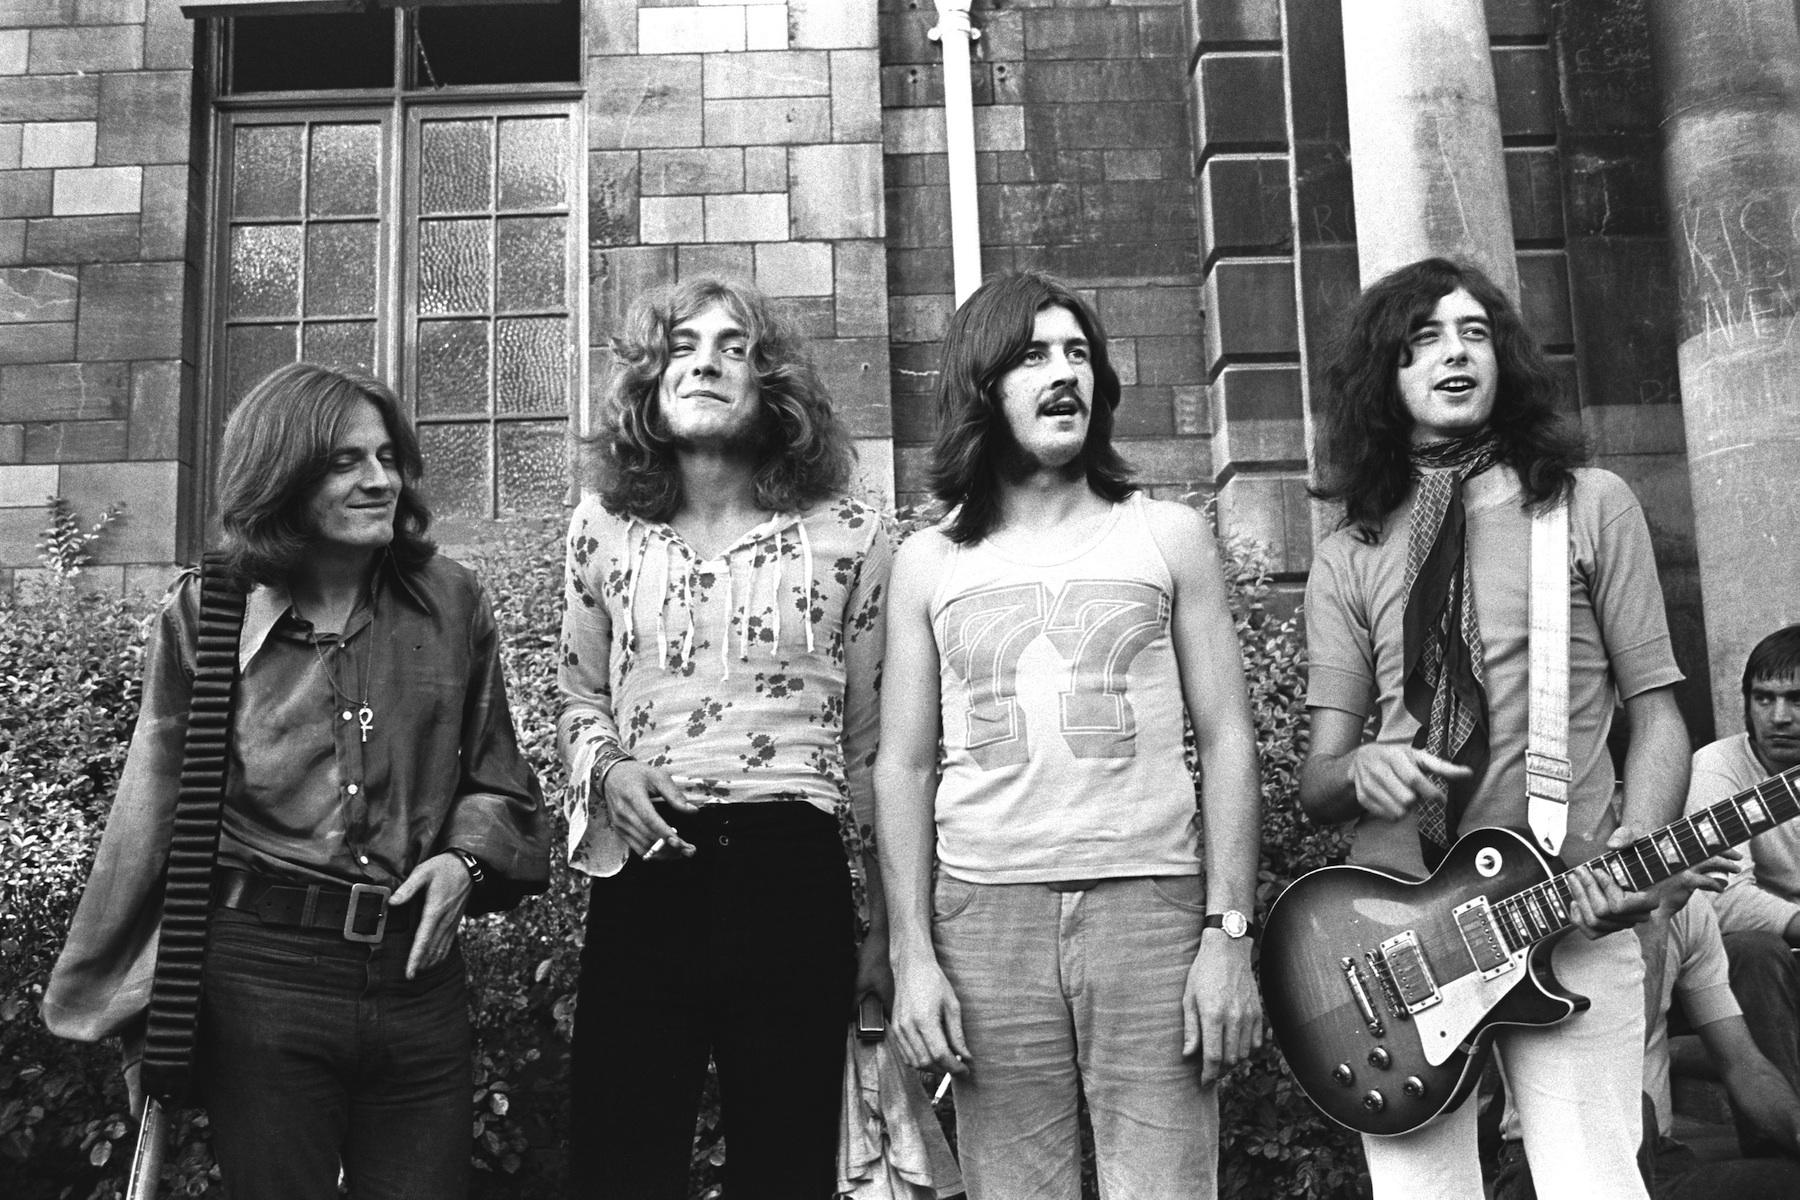 Judge Calls Led Zeppelin Lawsuit Lawyer 'Unprofessional, Offensive'